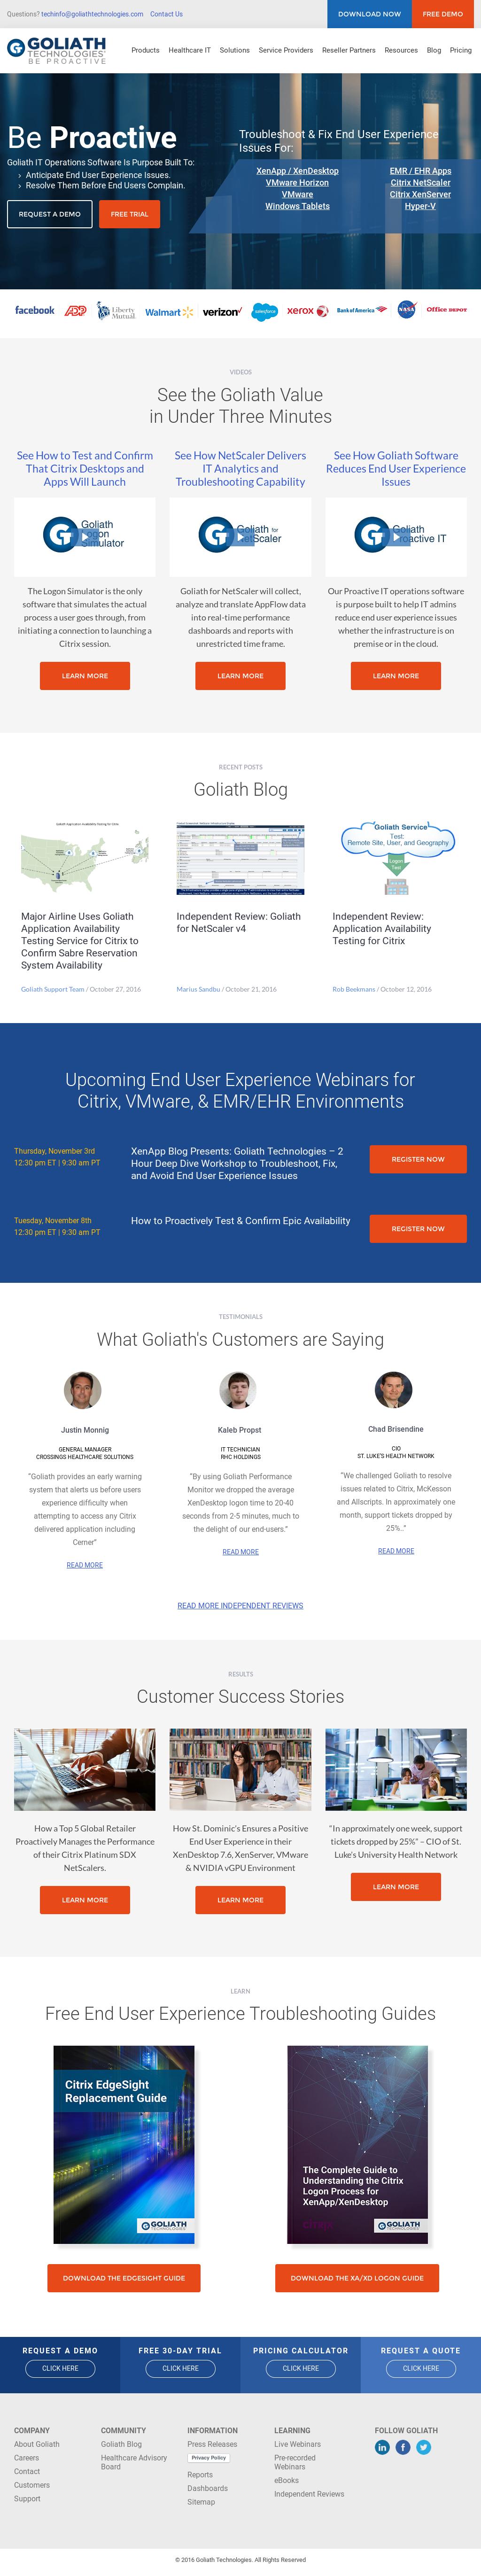 Goliath Competitors, Revenue and Employees - Owler Company Profile